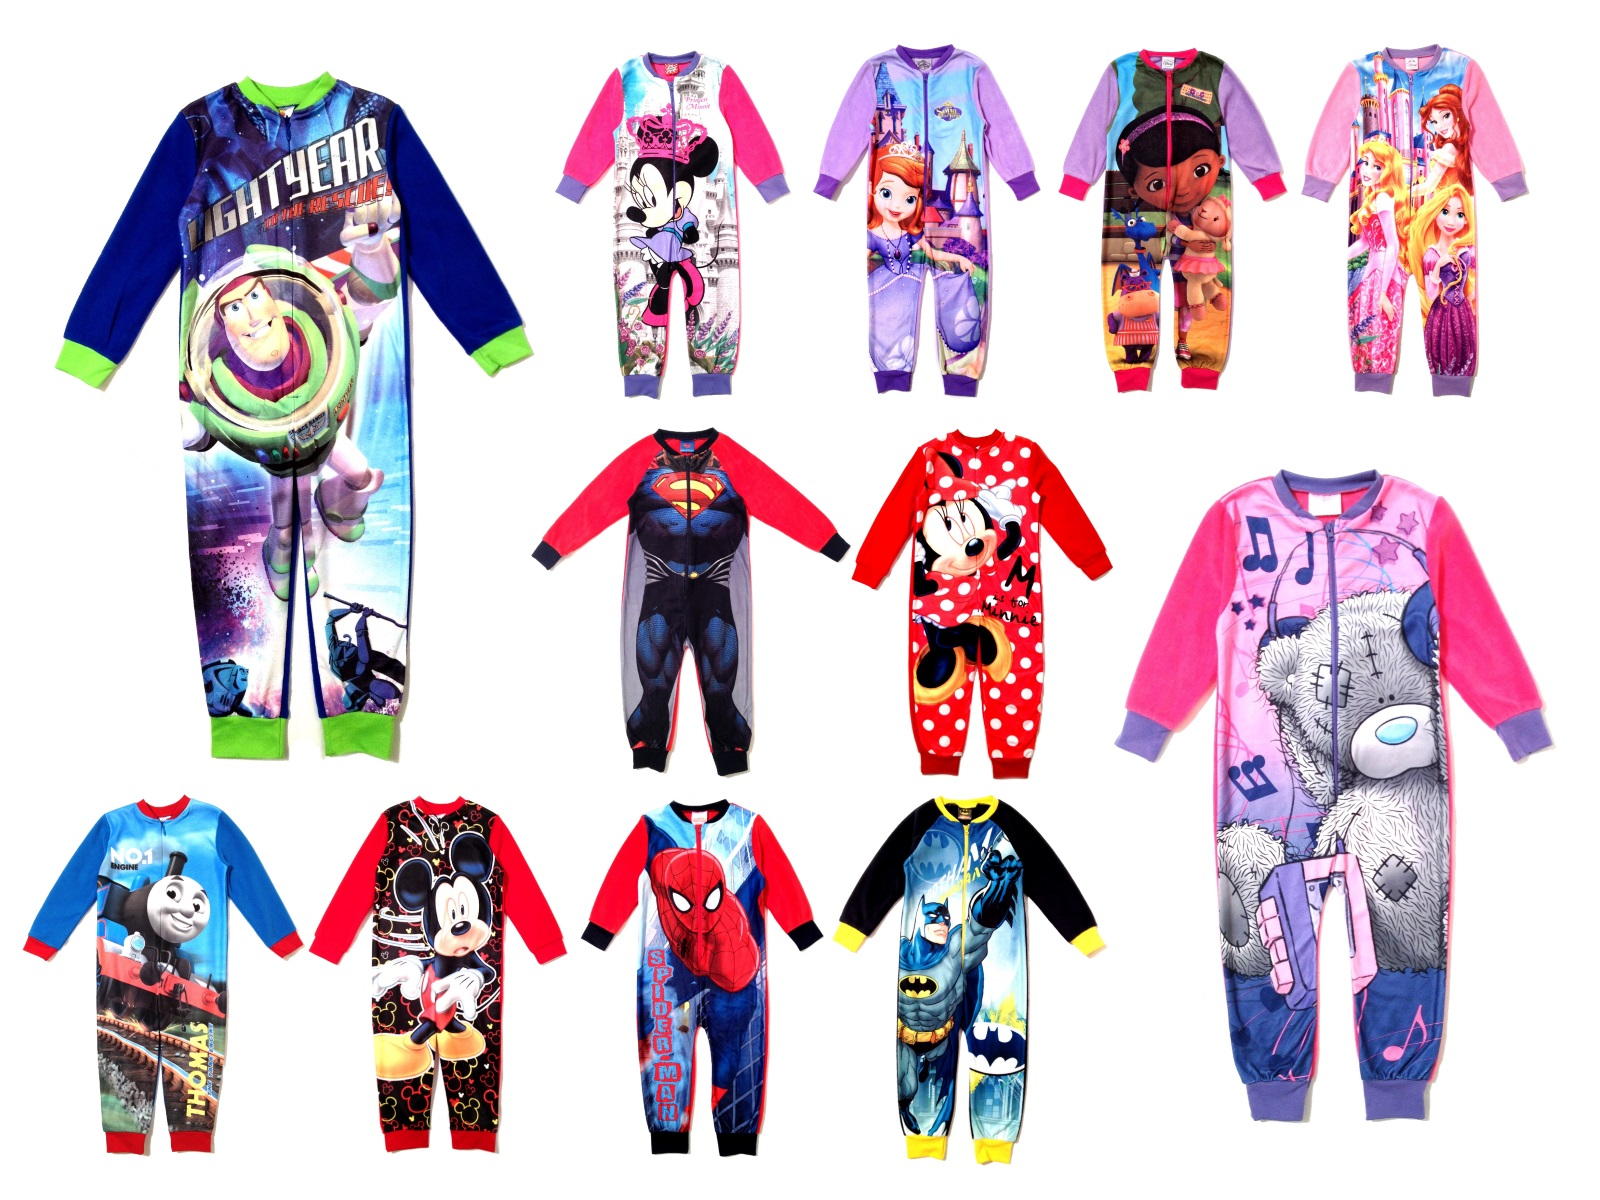 aa5db216df7d Kids Boys Girls Fleece Character Onesie Pyjamas Childrens Pj s Size ...